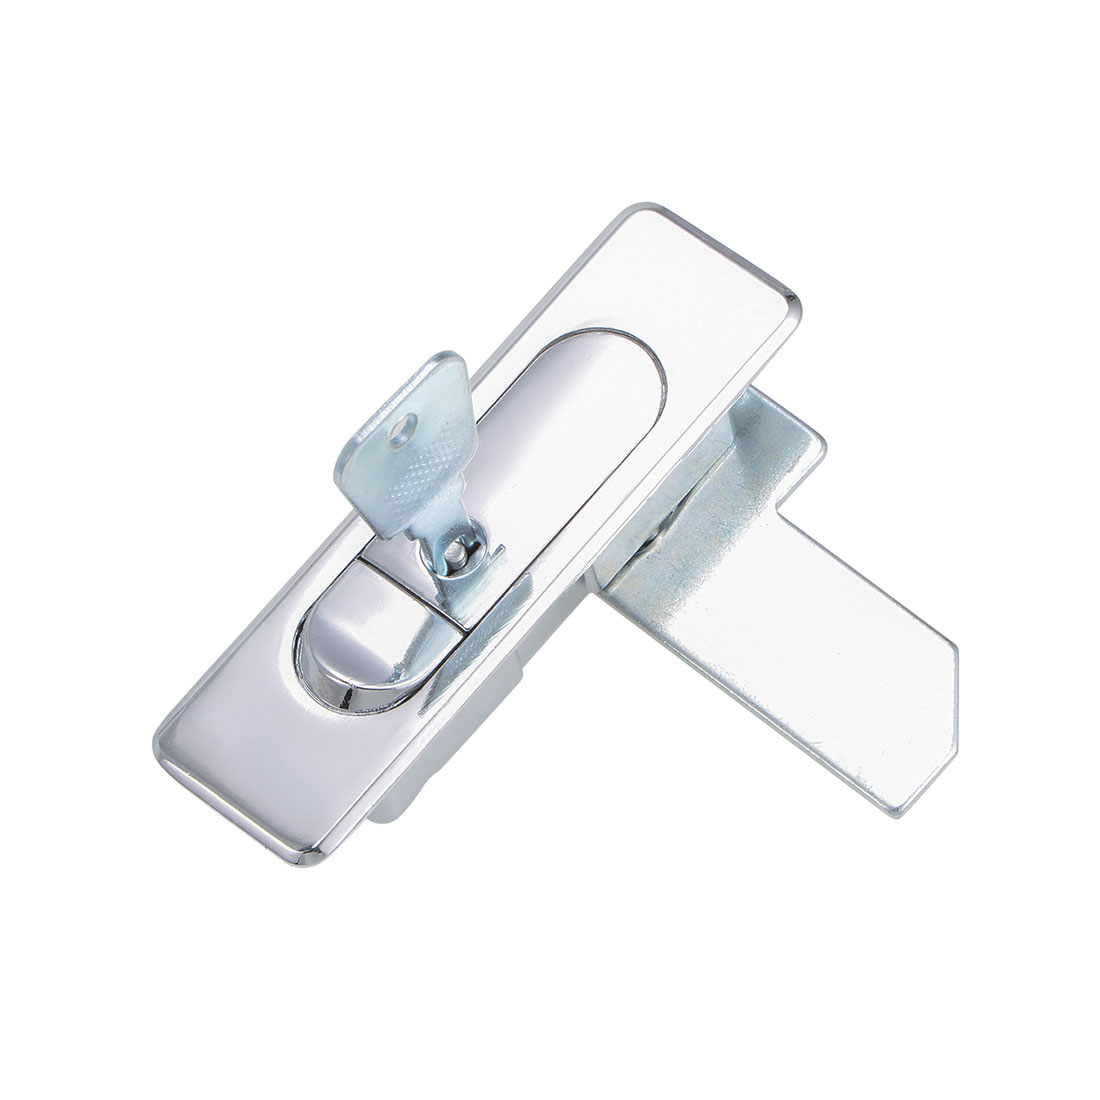 Electric Cabinet Panel Cam Lock Push Button Pop Up Type Door Lock w Key Glossy